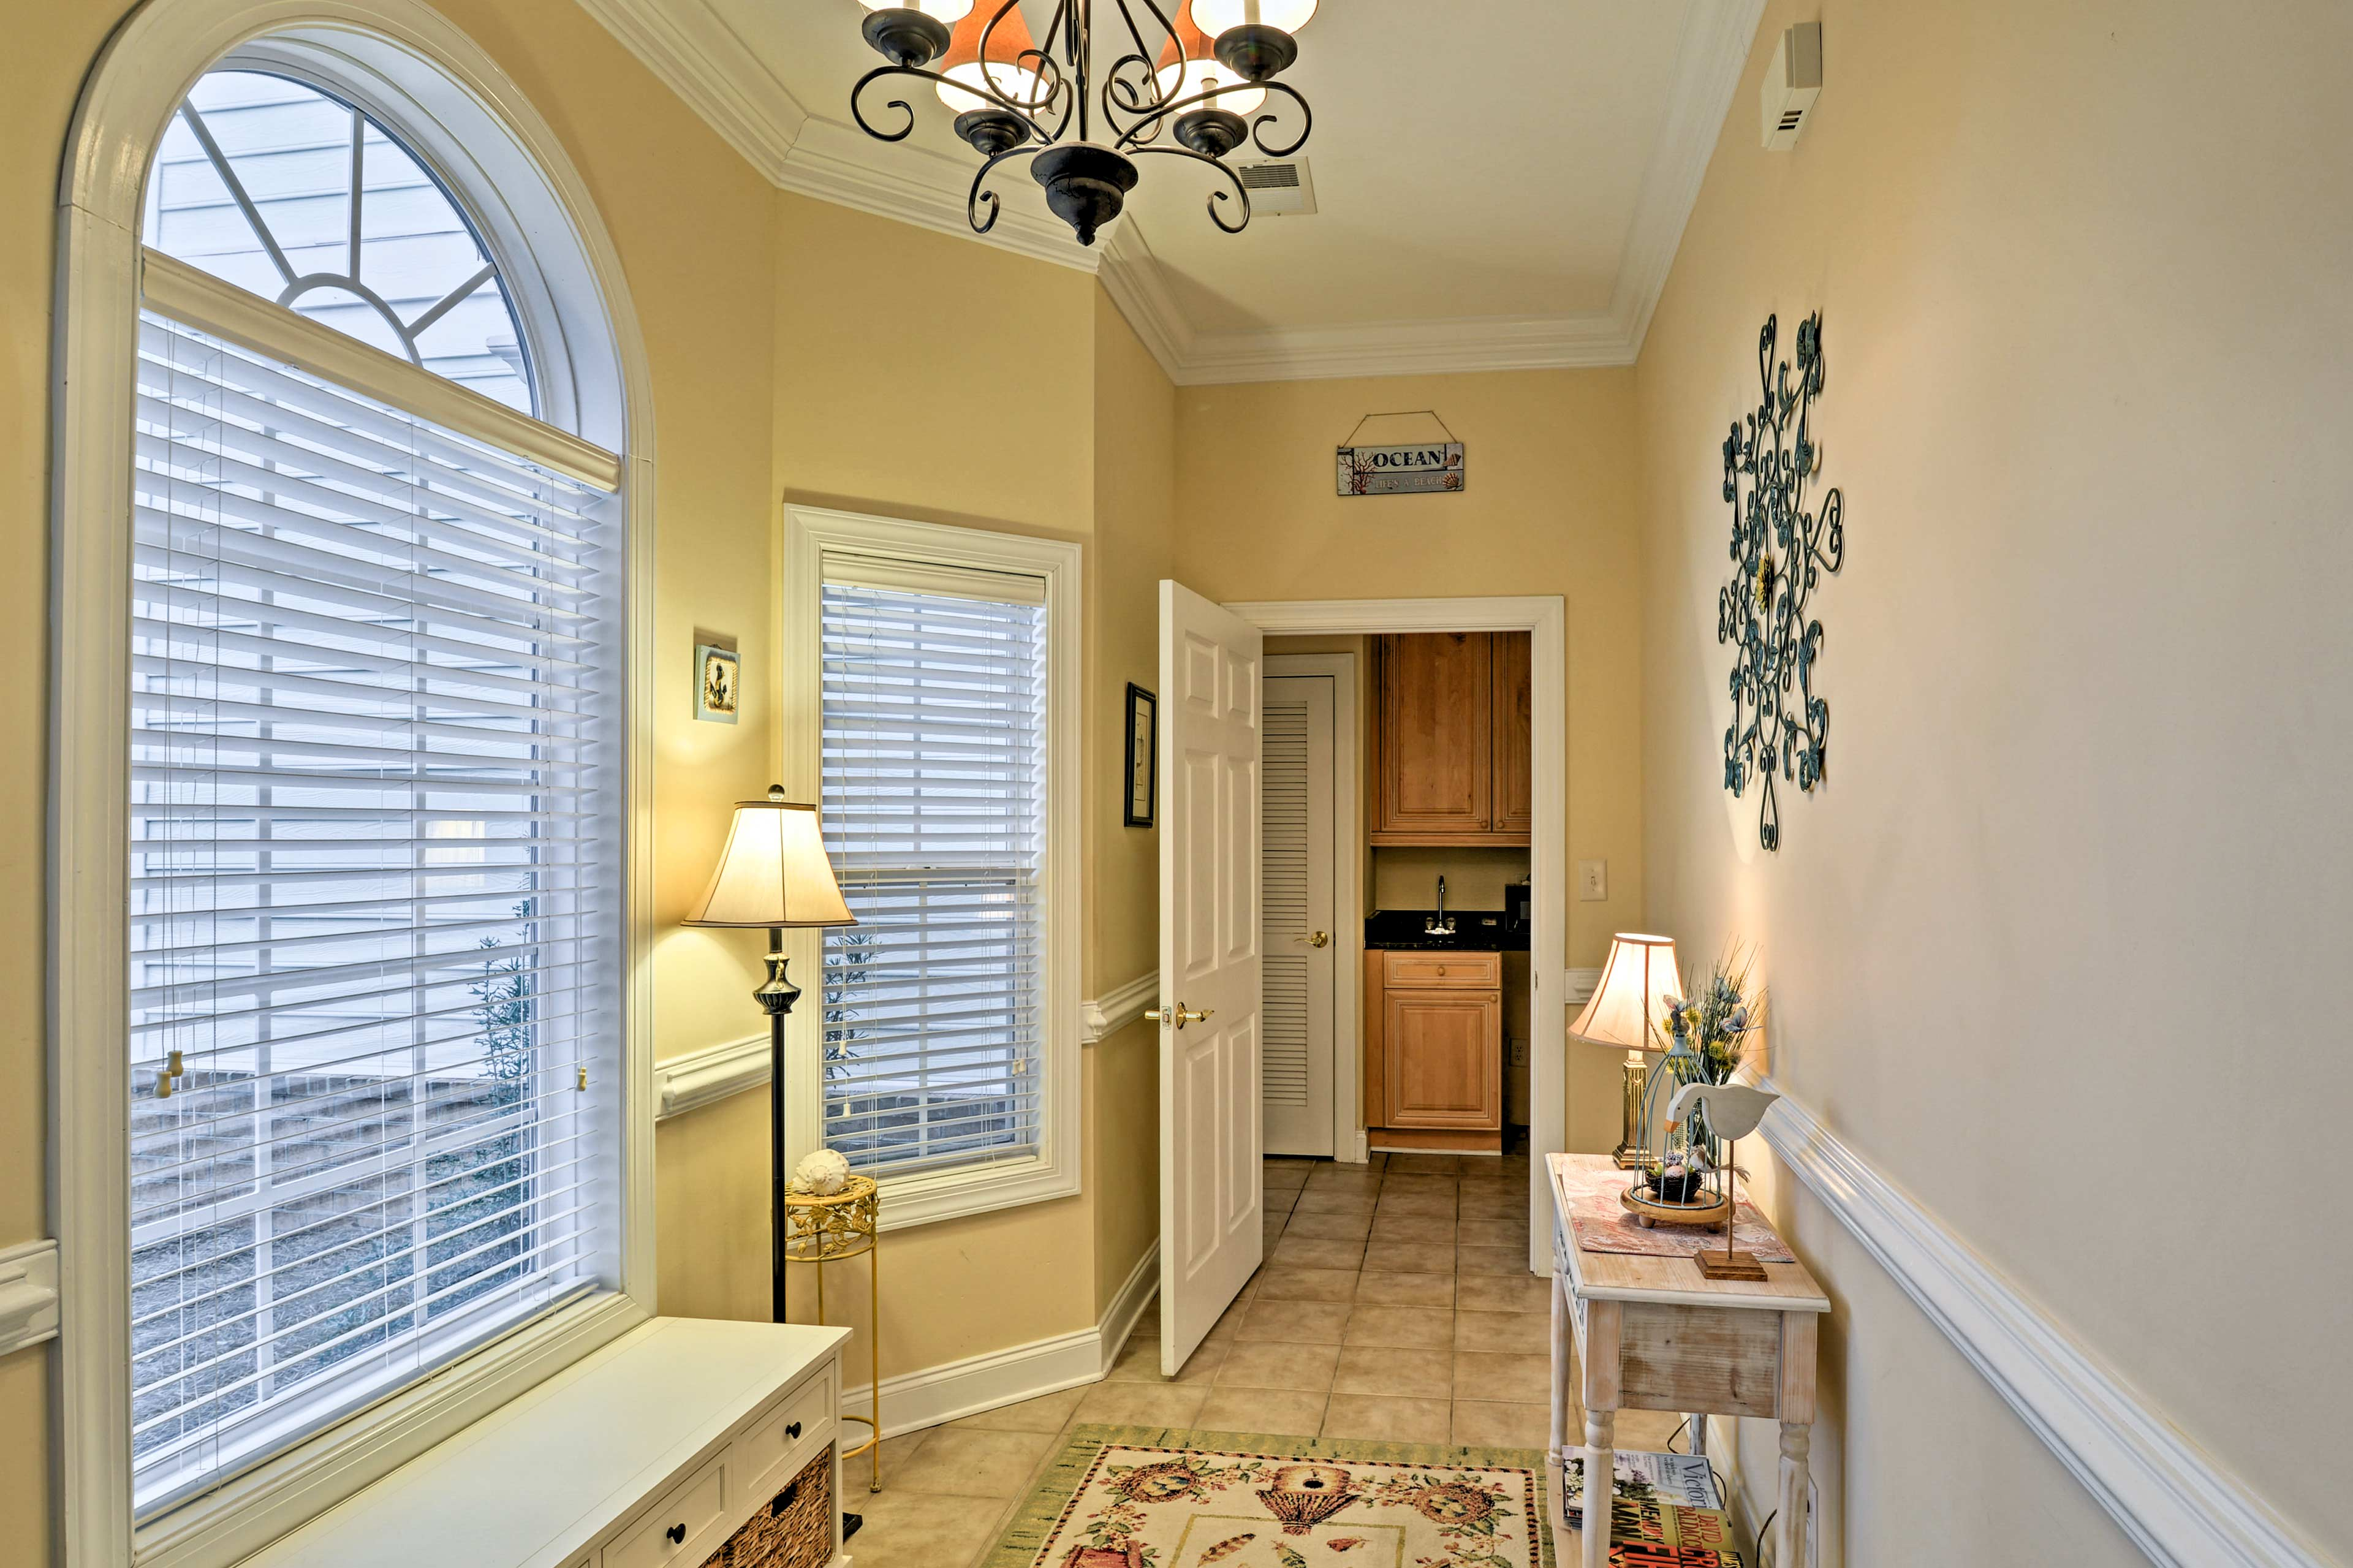 Ample sunlight shines through the windows, illuminating the foyer.